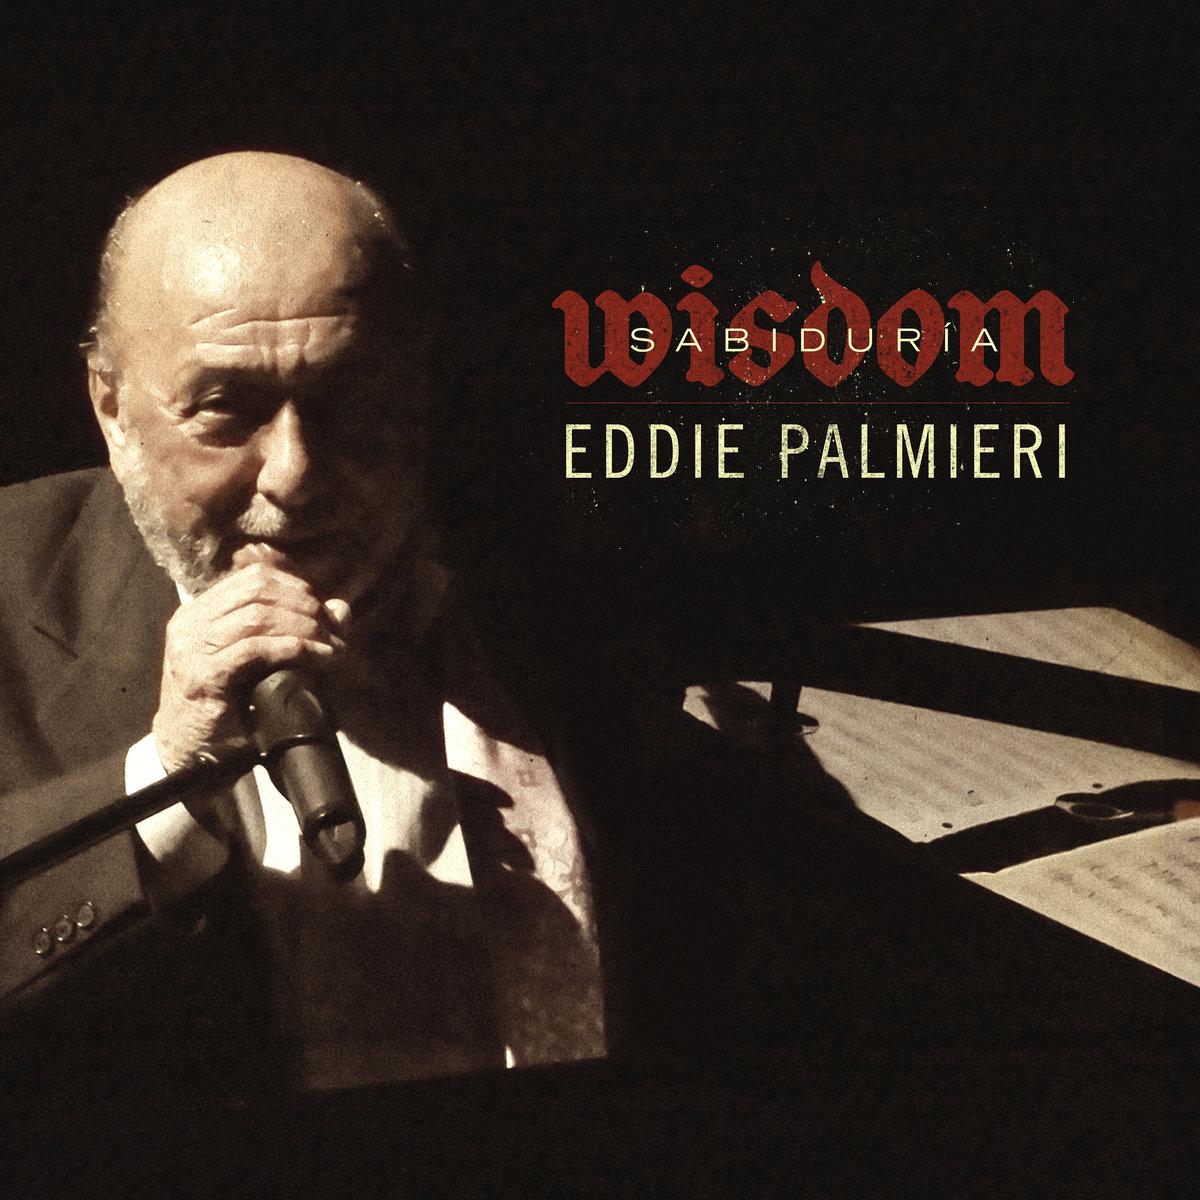 Sabiduria Wisdom  Eddie Palmieri  2017